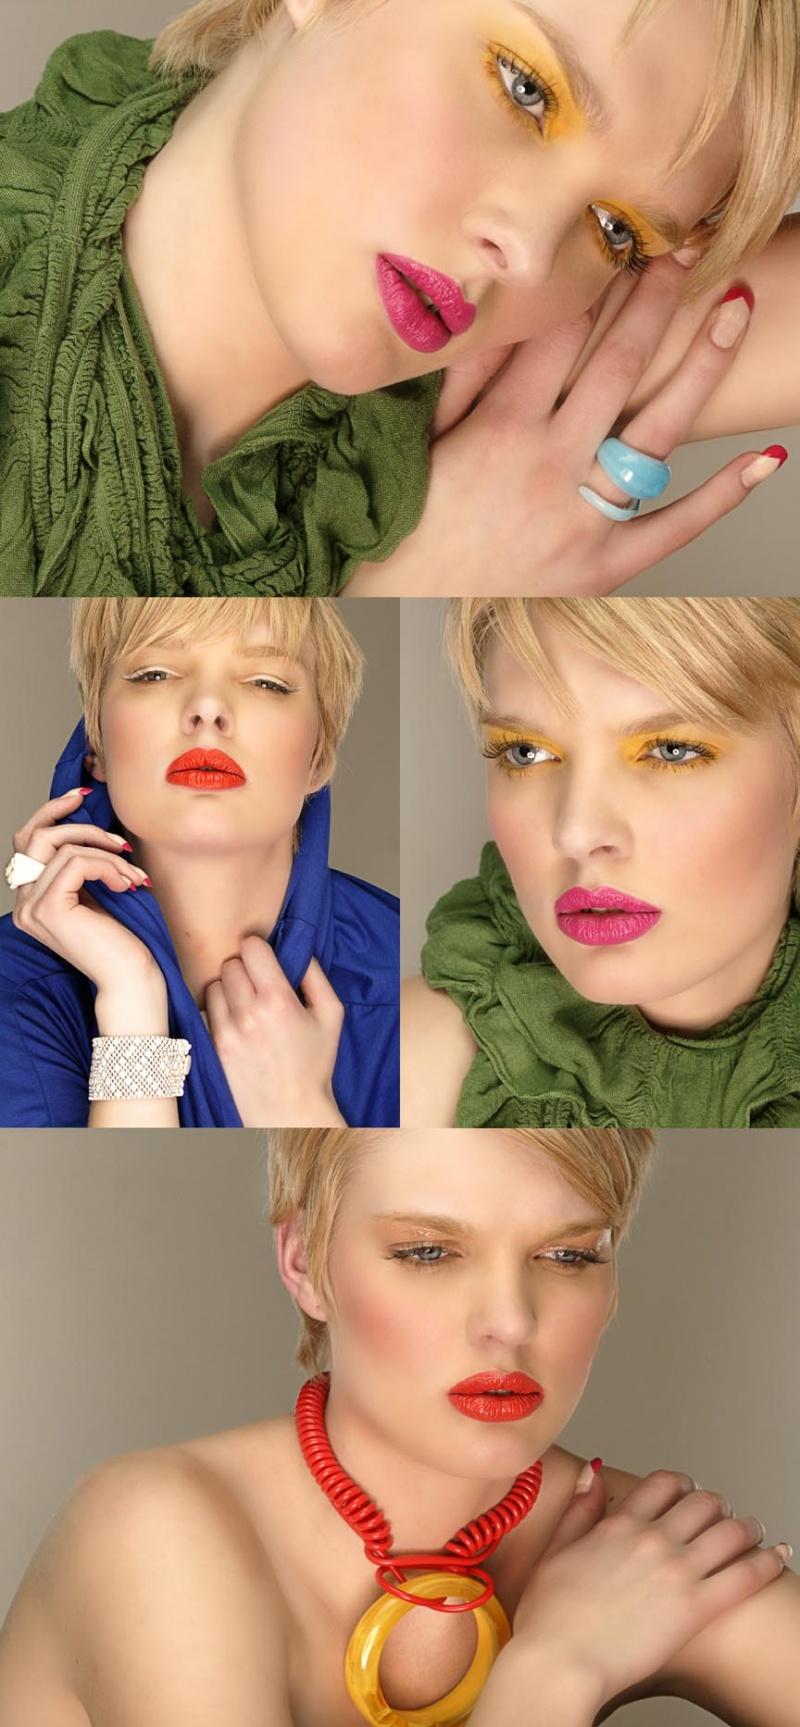 Sep 04, 2009 2009 GL Beauty Model: Stef ~~ MUA: Cheryl